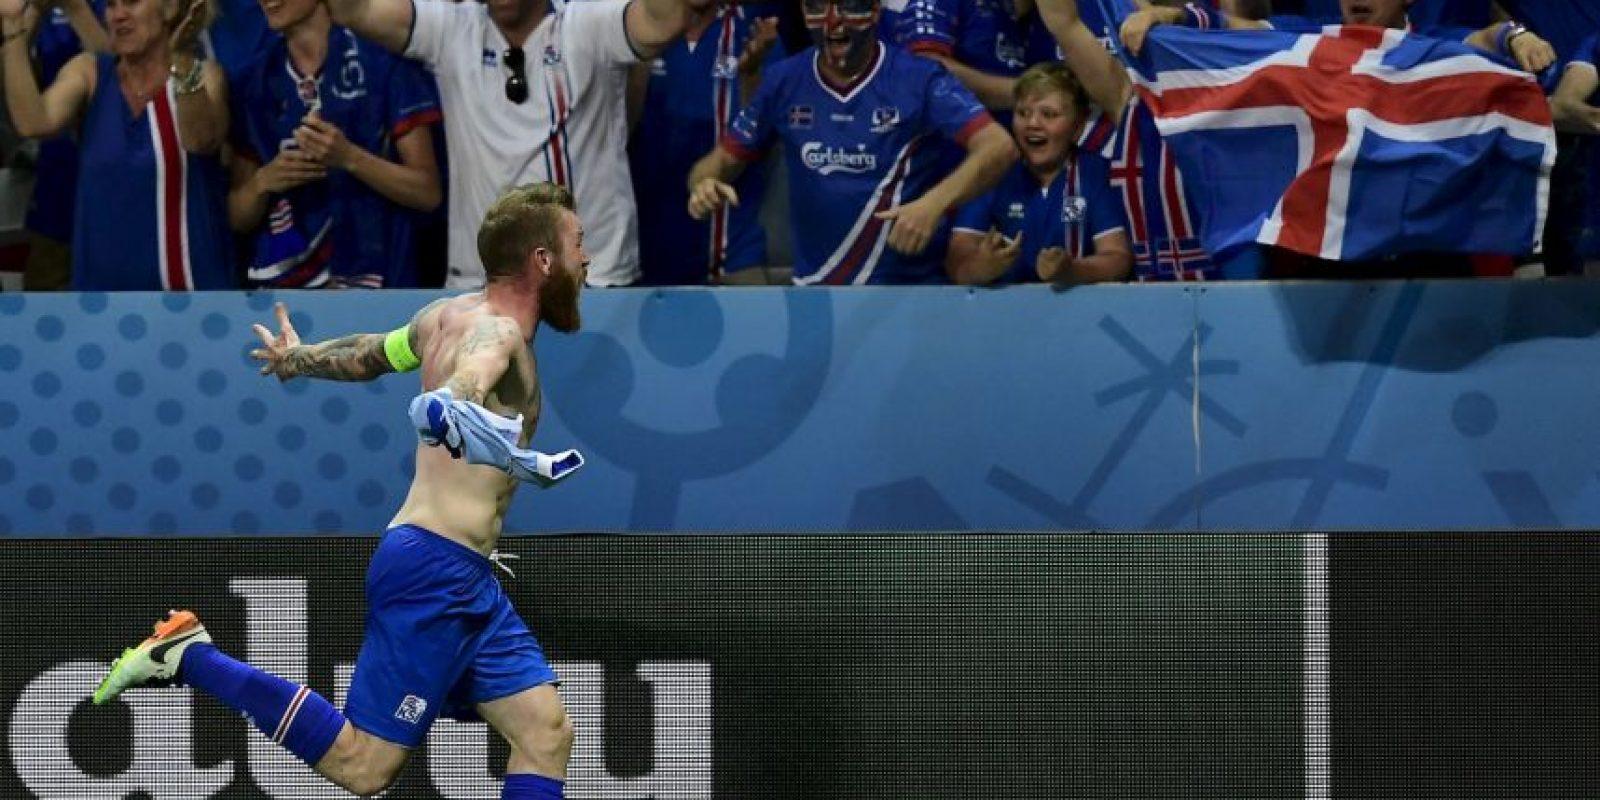 Islandia venció a Inglaterra en octavos de final de la Euro 2016 Foto:Getty Images